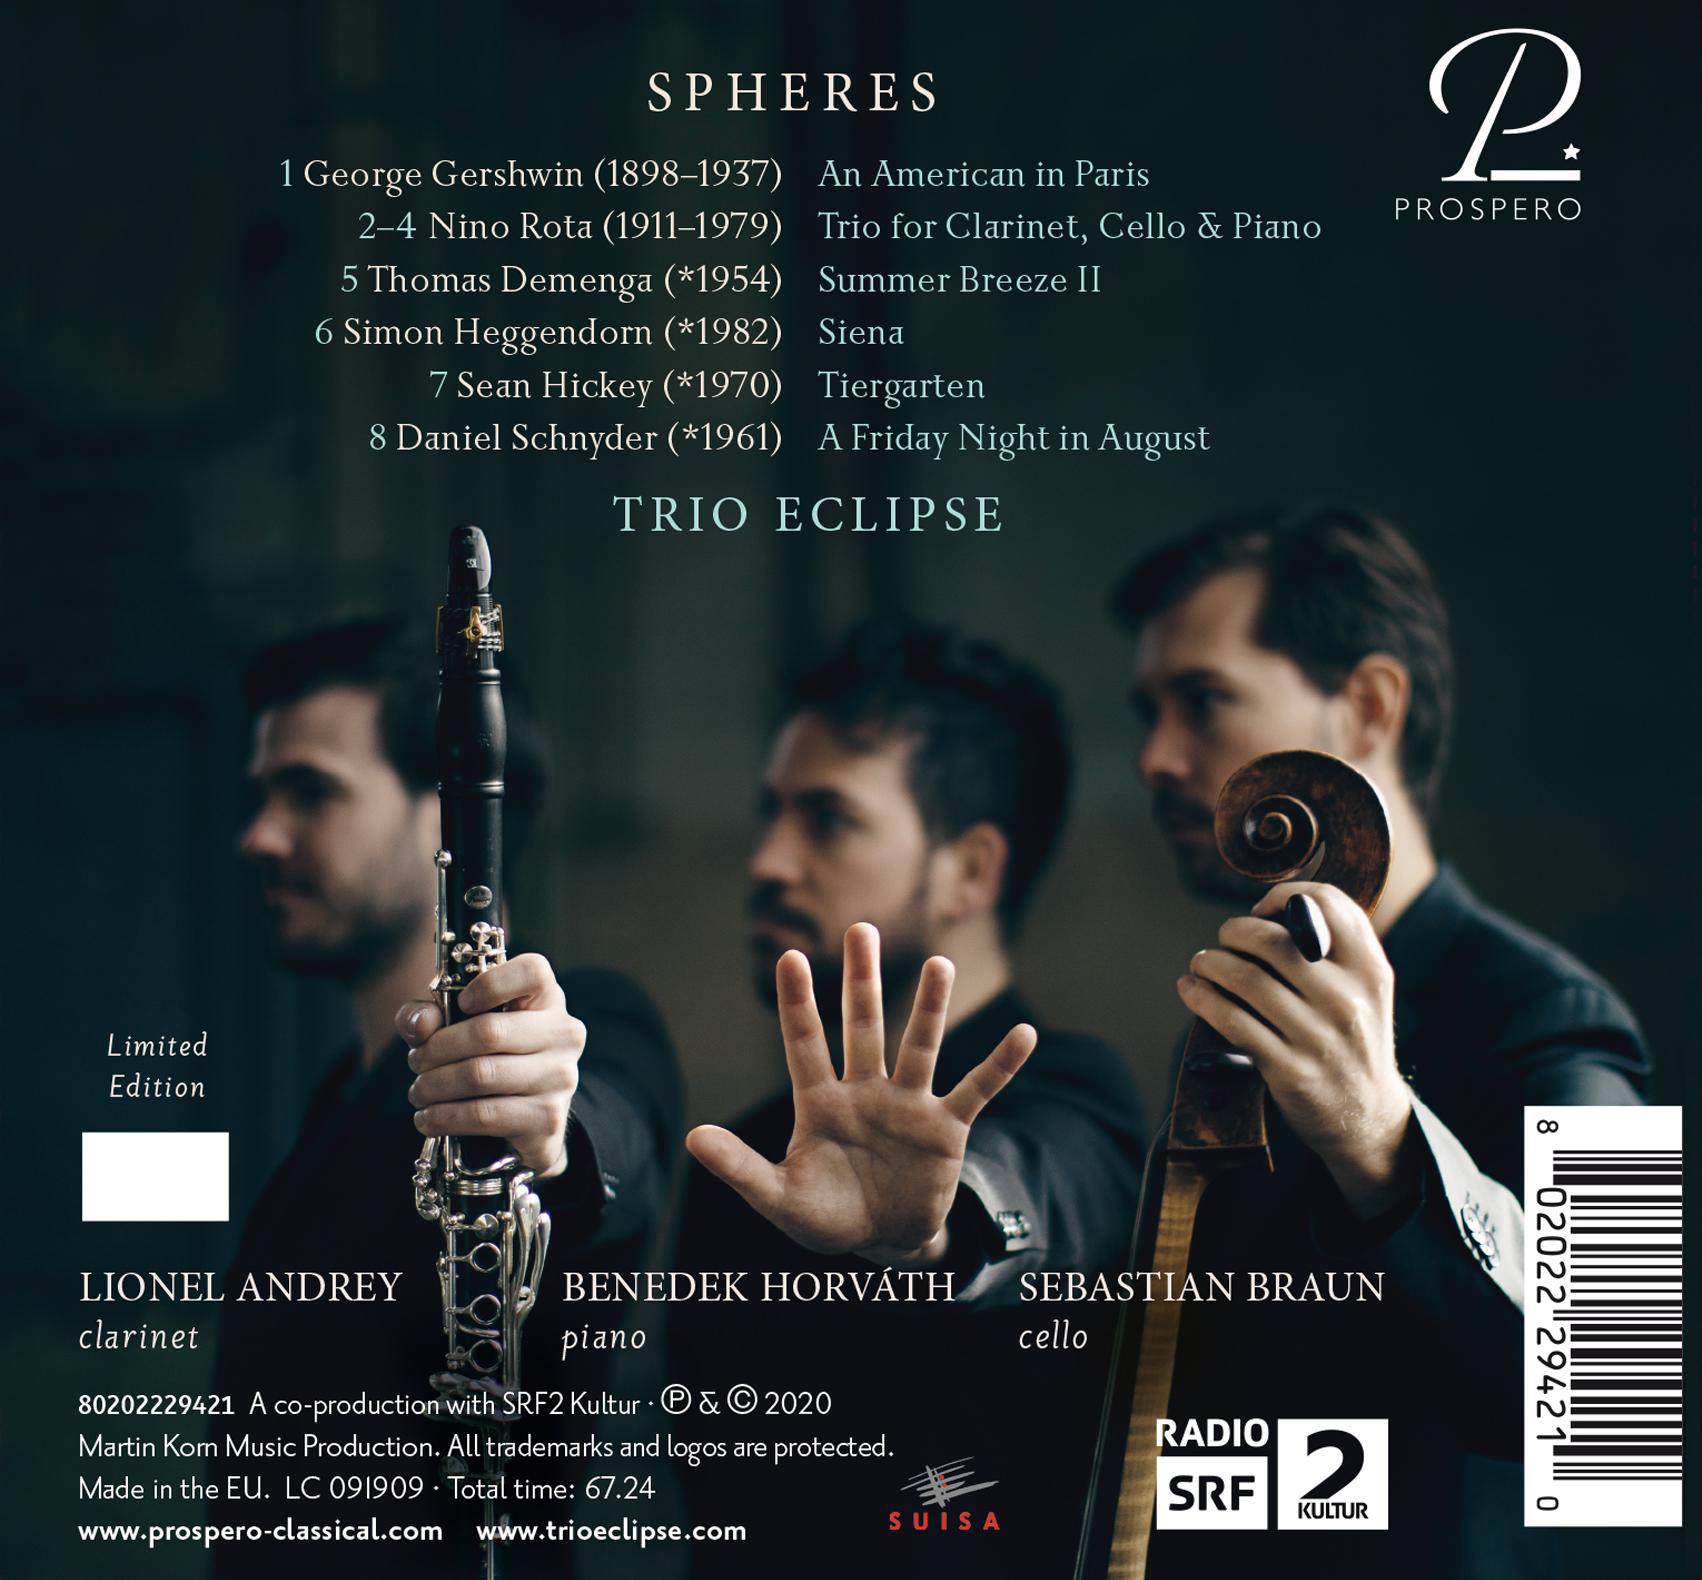 Trio Eclipse: Spheres - Hardcover Book Back